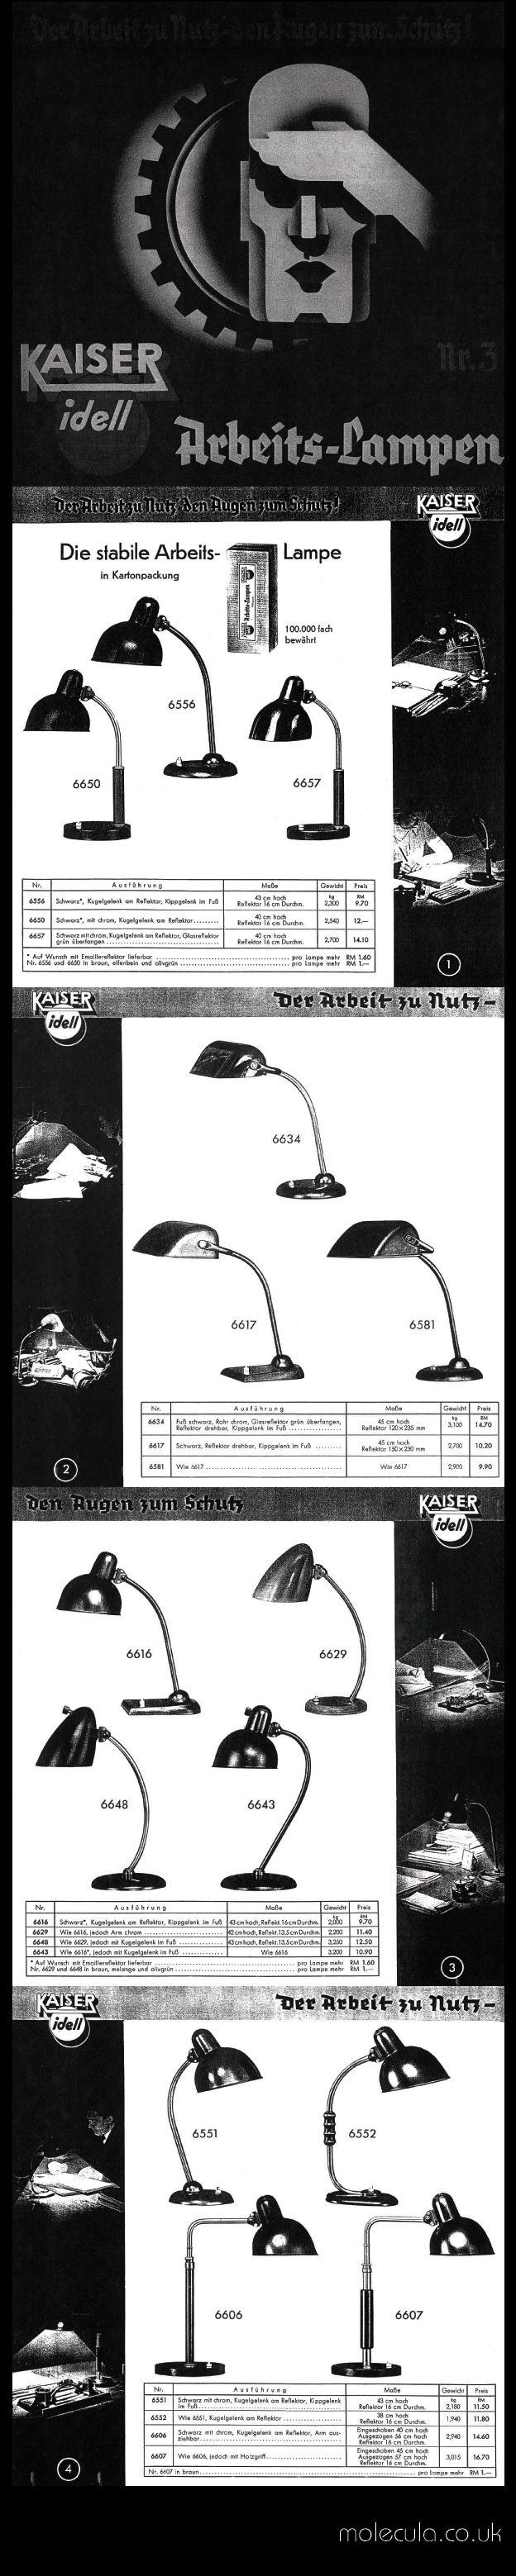 Rare Kaiser & Co. Work Lamp Catalogue 1936 - Pages 1 to 4 #KaiserIdell #Kaiser_Idell #ChristianDell #Bauhaus #Modernism #Modernist #Molecula